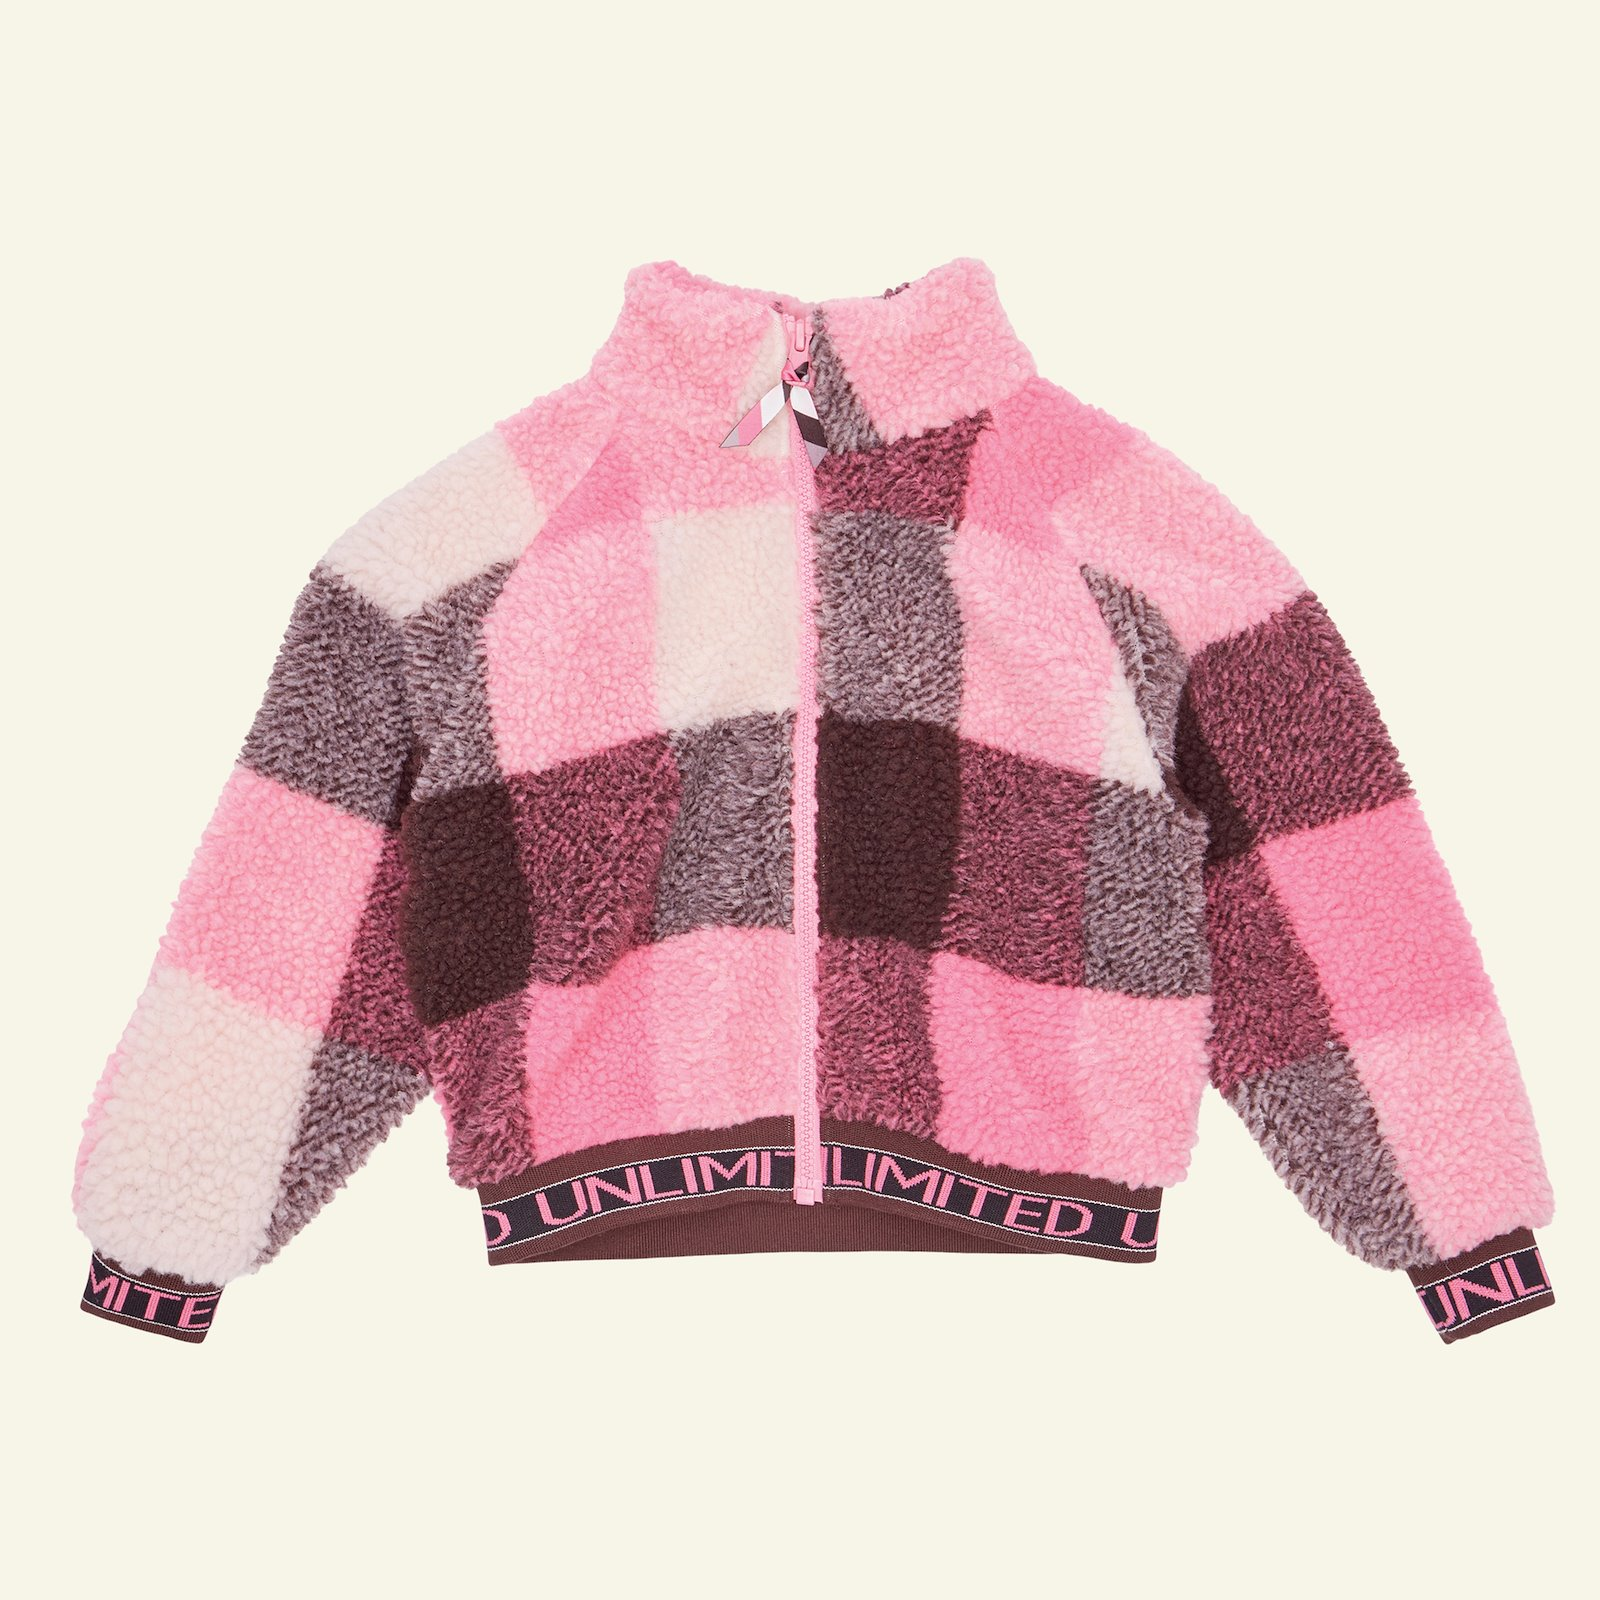 Anorak and jacket, 140/10y p64020_910277_96184_sskit